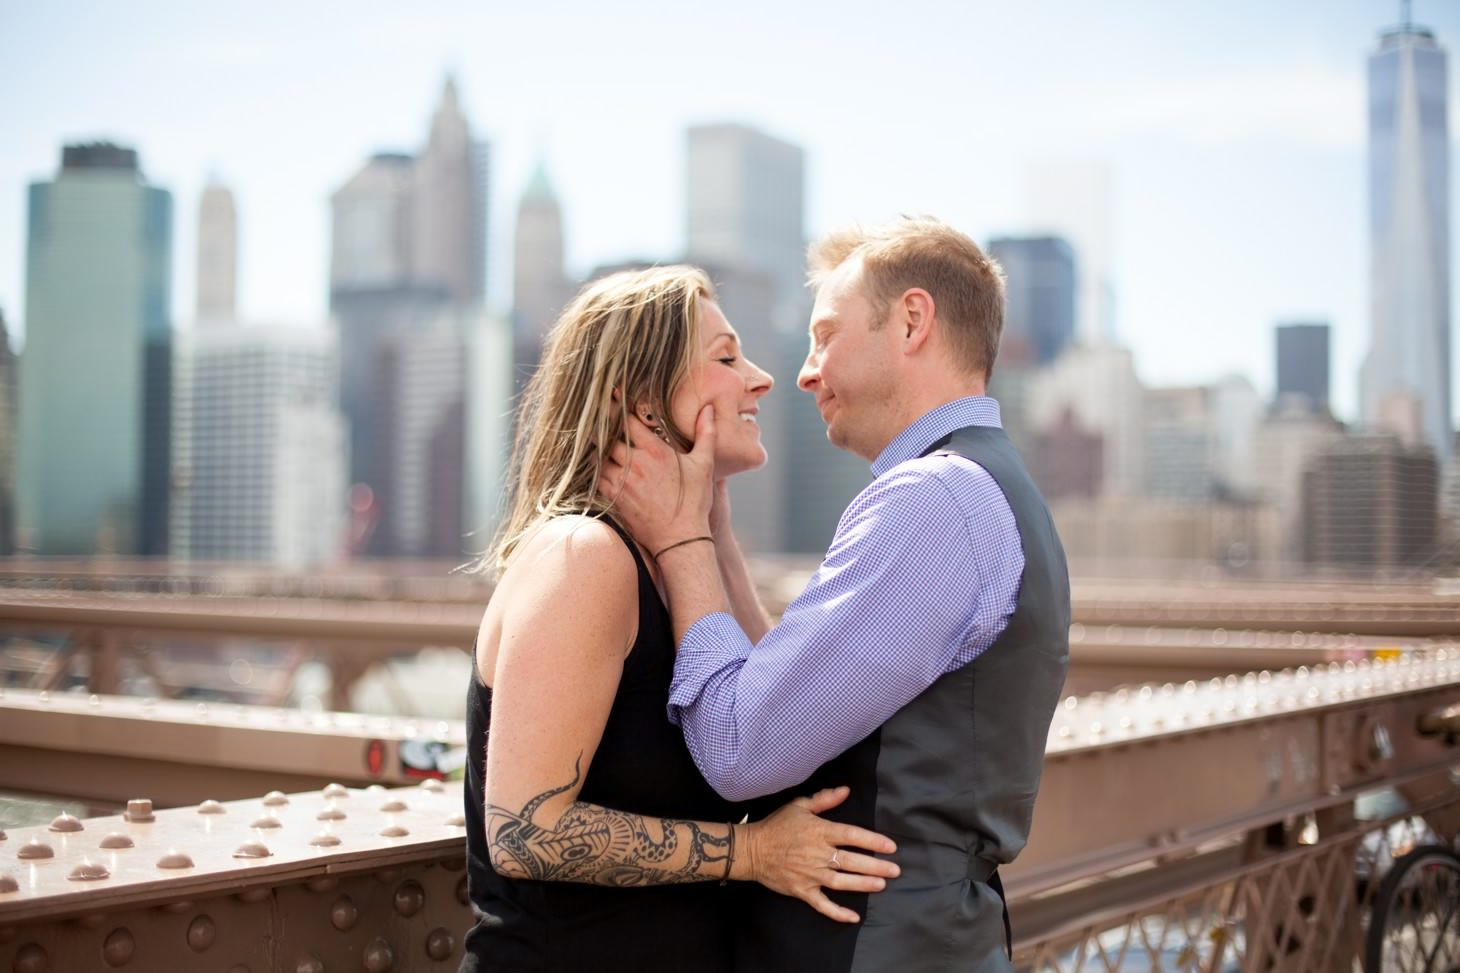 nyc-wedding-photographer-brooklyn-bridge-smitten-chickens-engagement-brooklyn-bridge-005.jpg